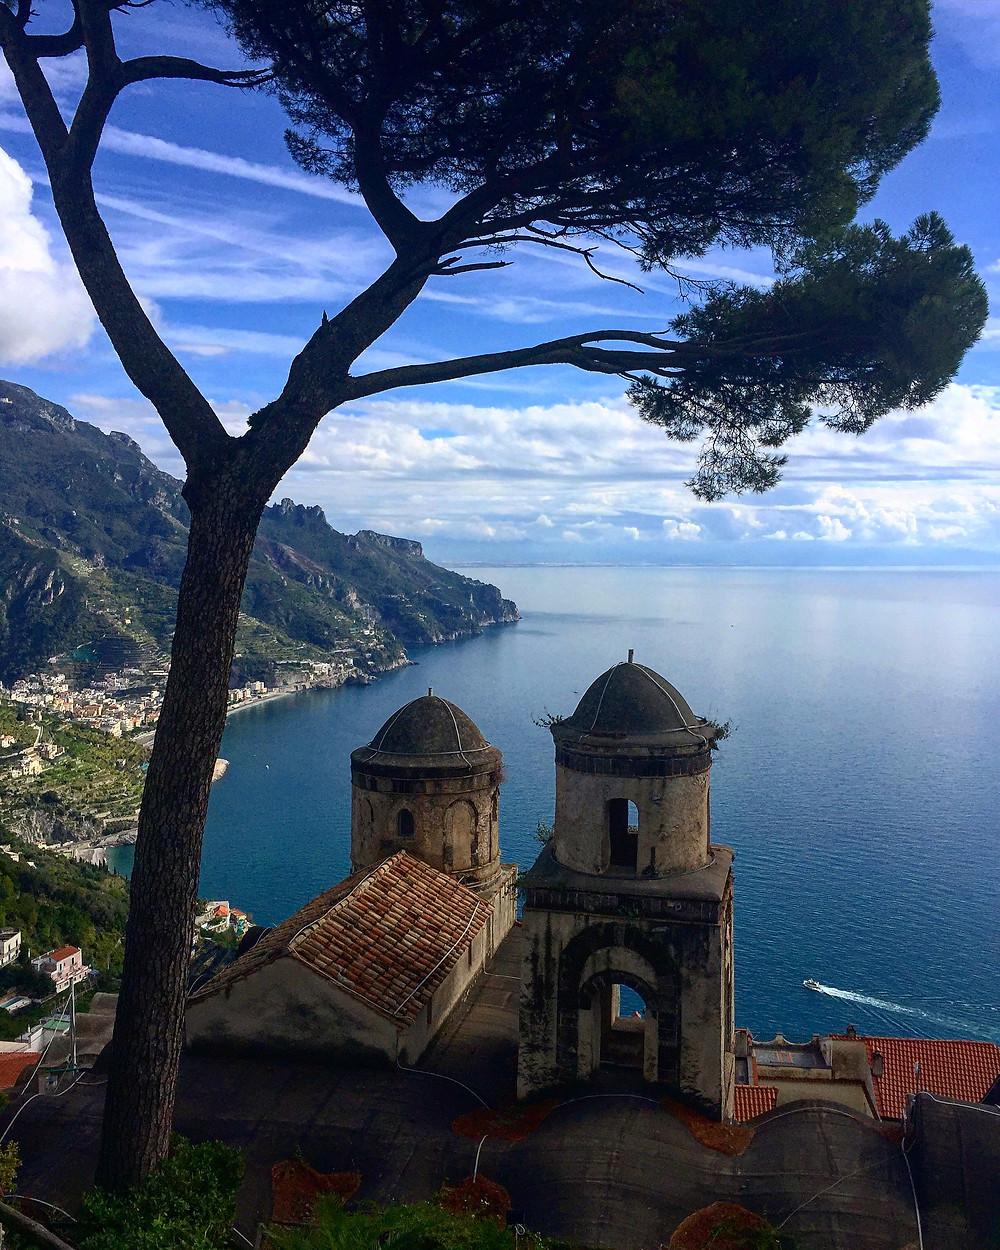 Amalfi Coast from Villa Rufolo.